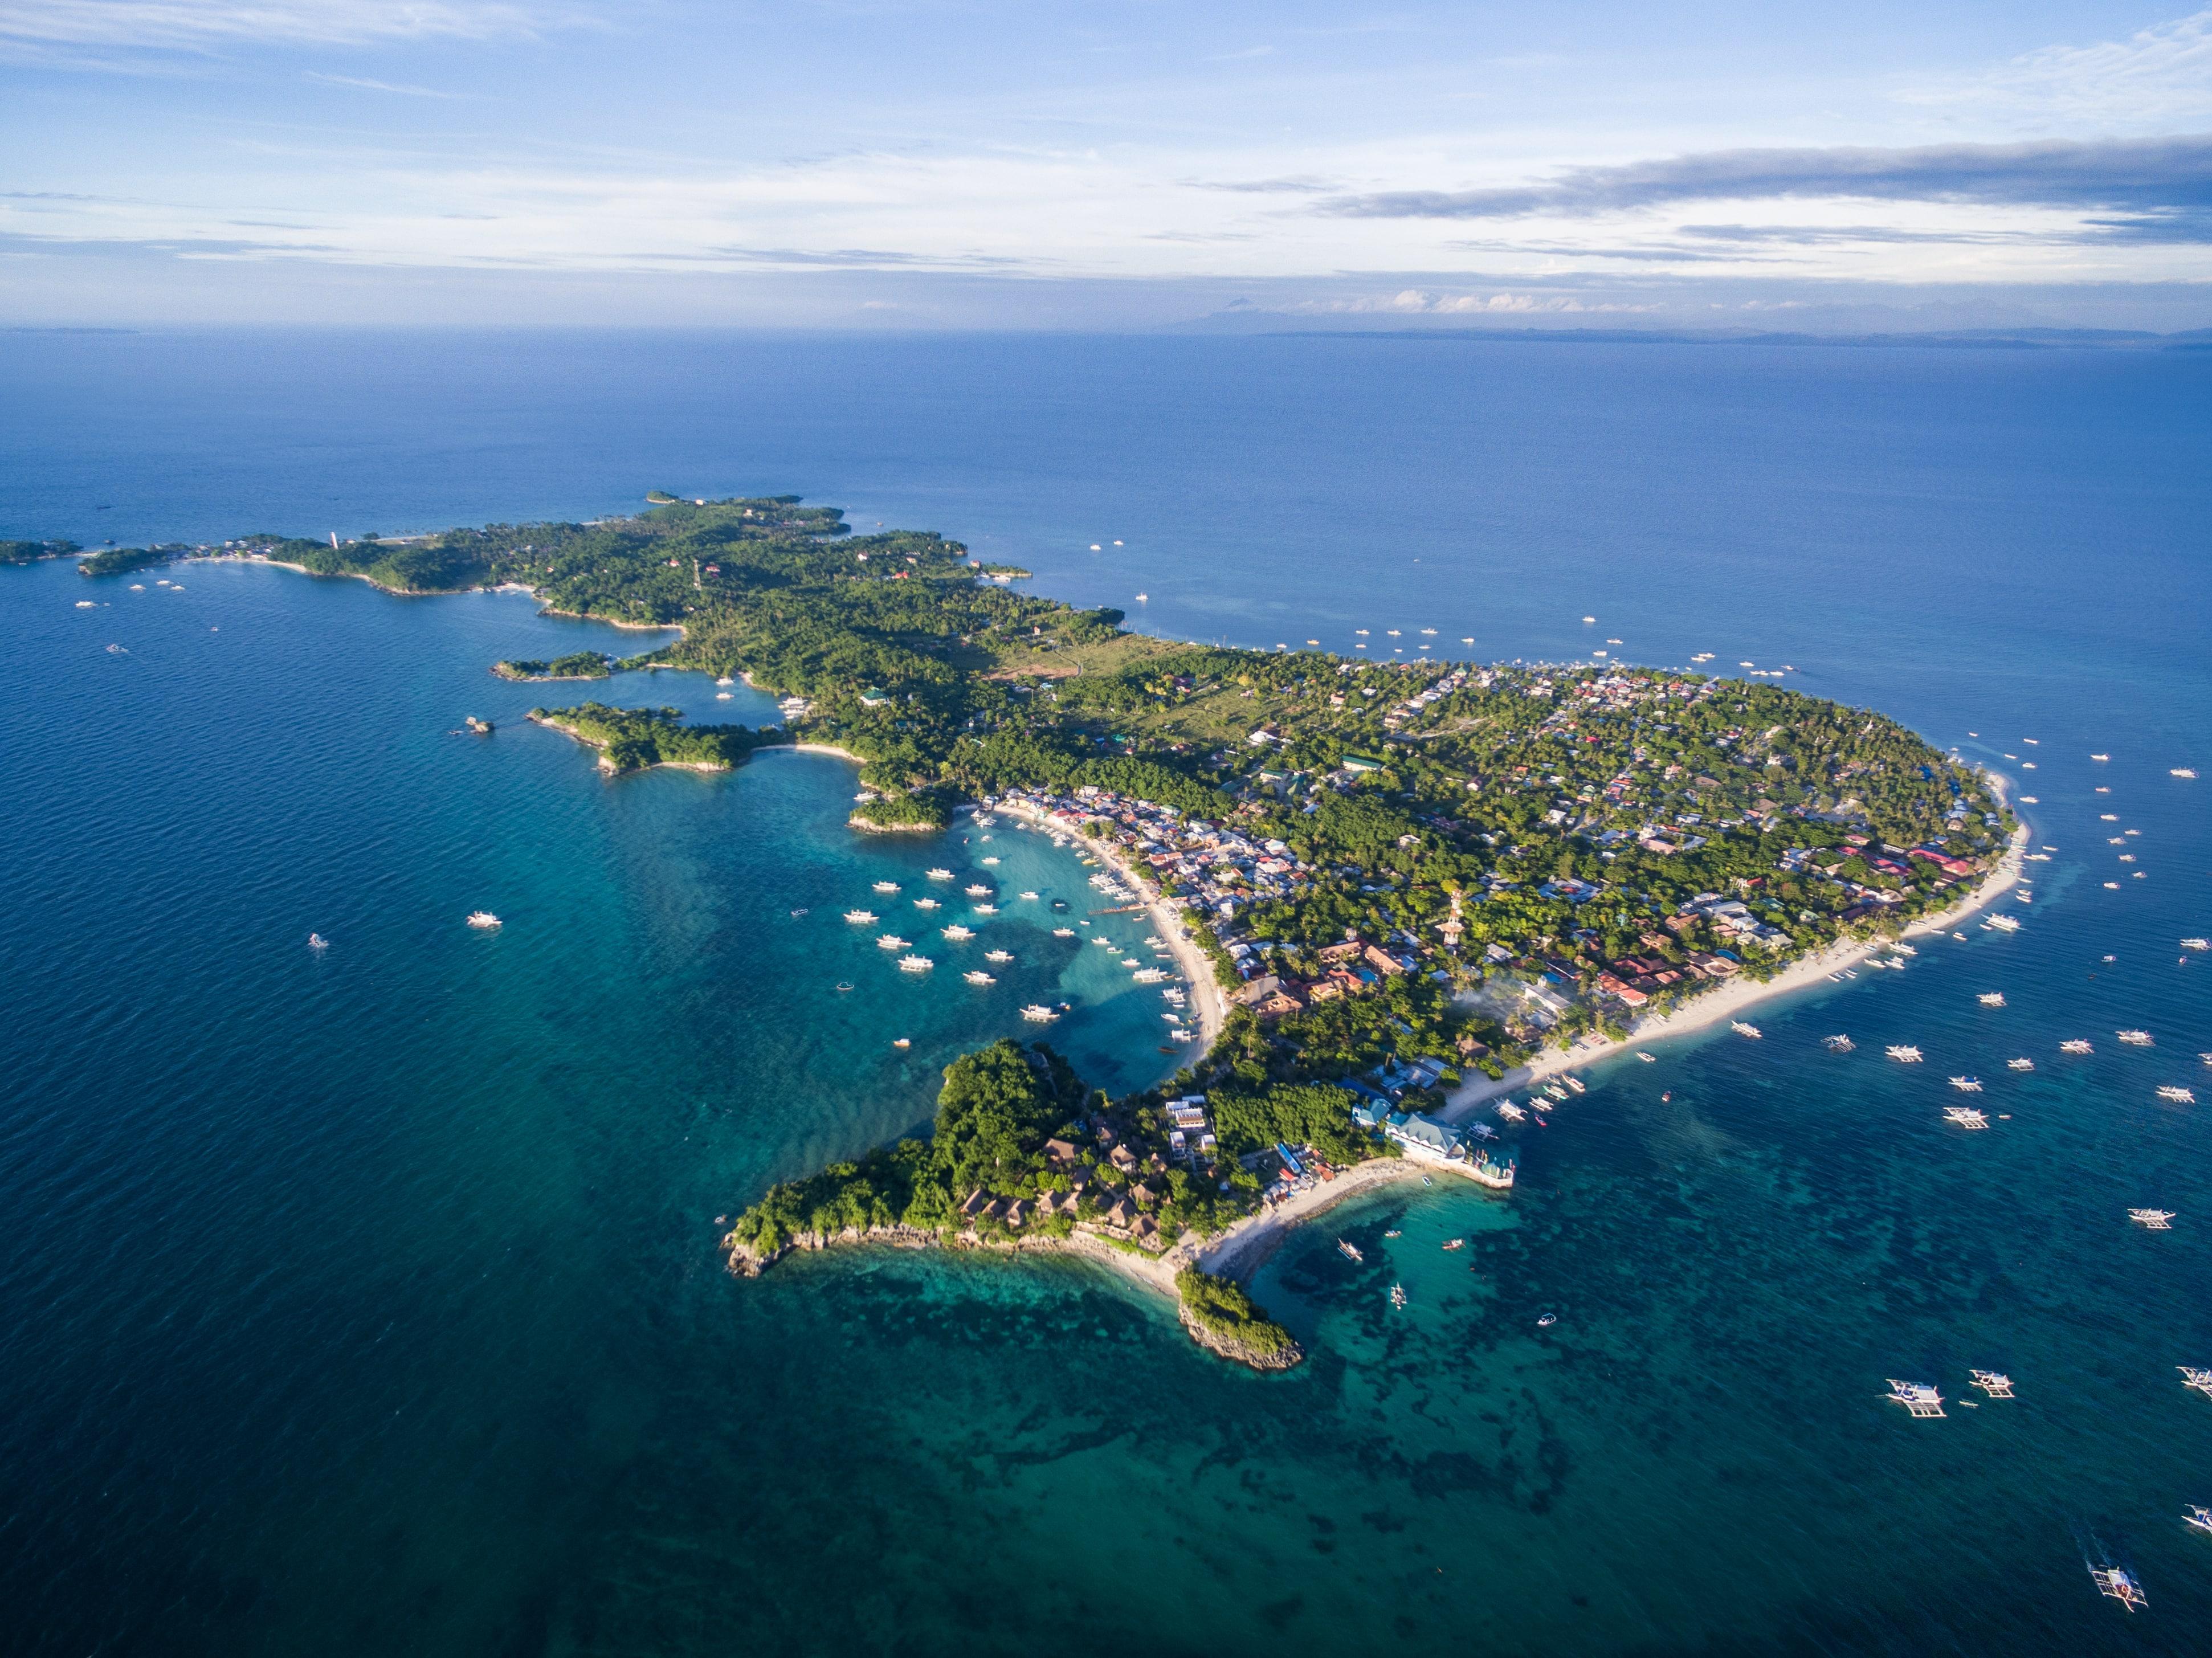 Aerial view of Malapascua Island in Cebu